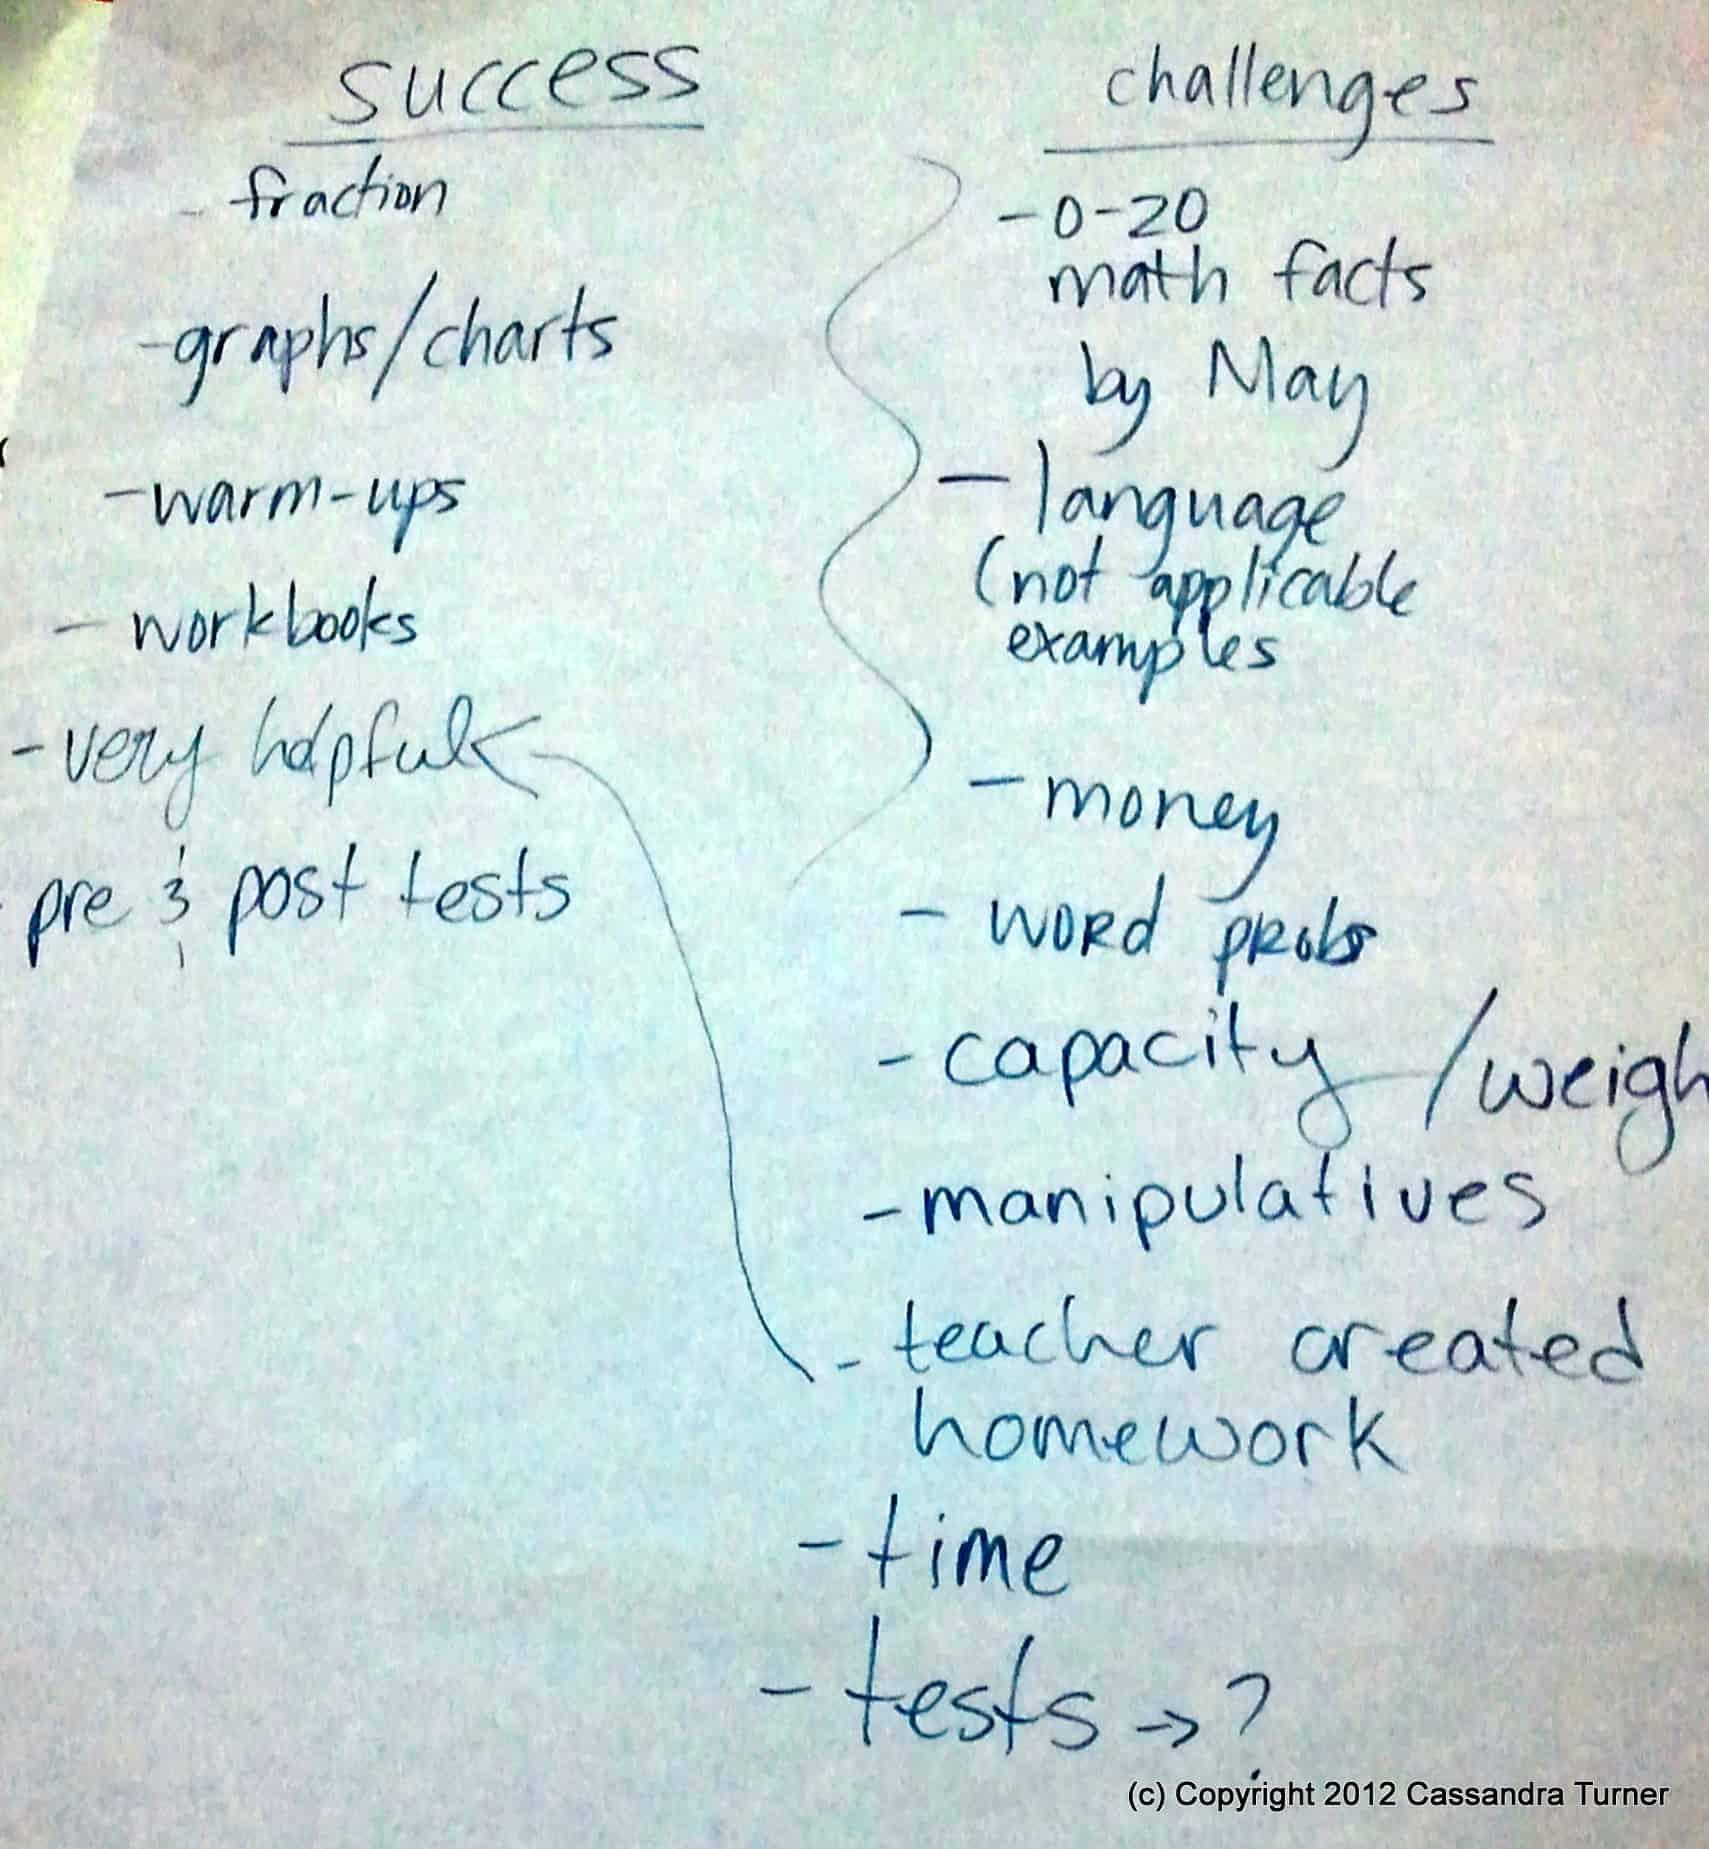 Adopting Singapore Math - Challenges and Successes | SingaporeMathSource